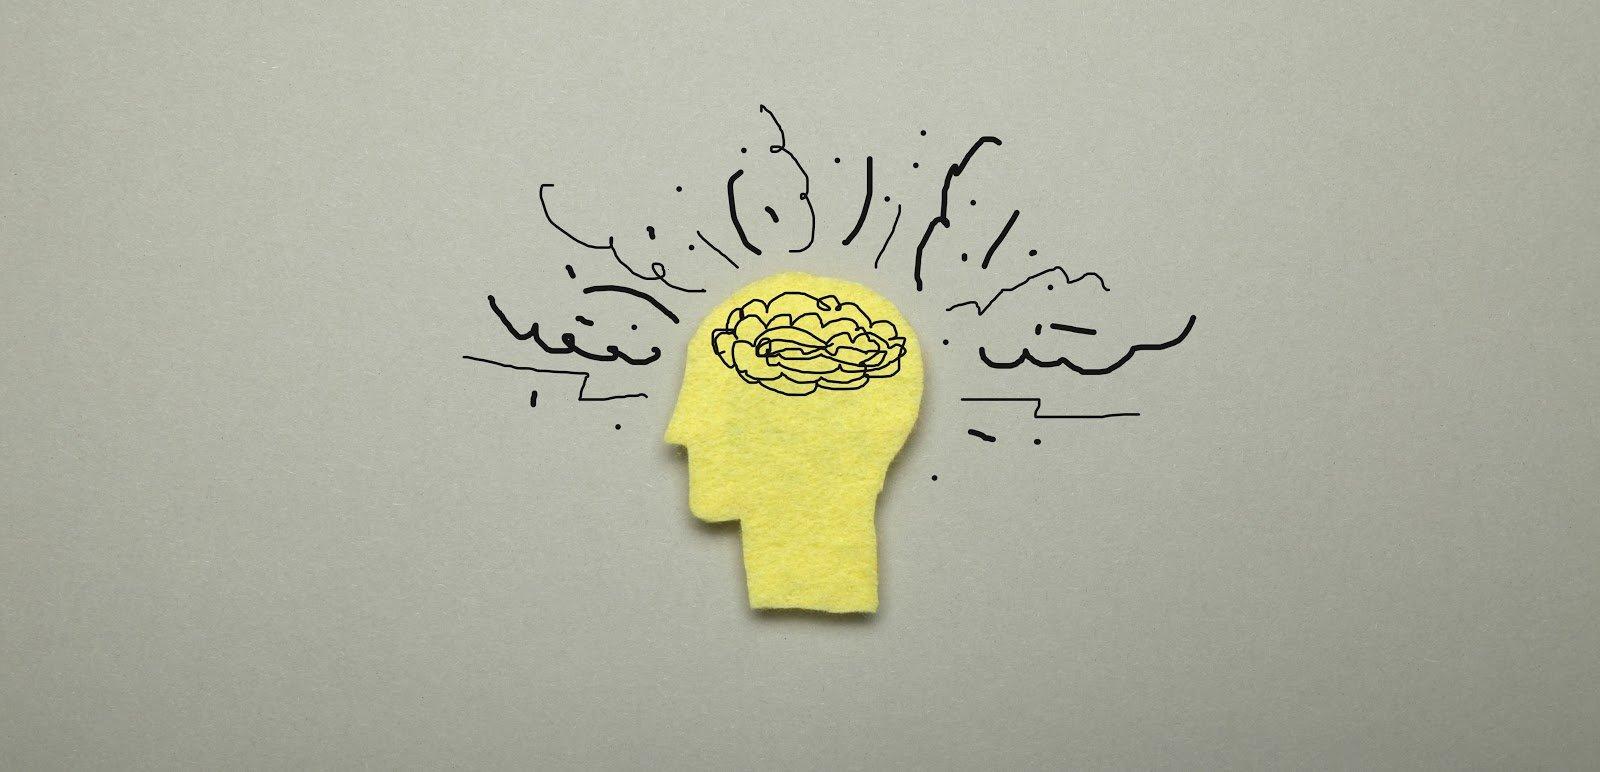 Illustration depicting brain fog